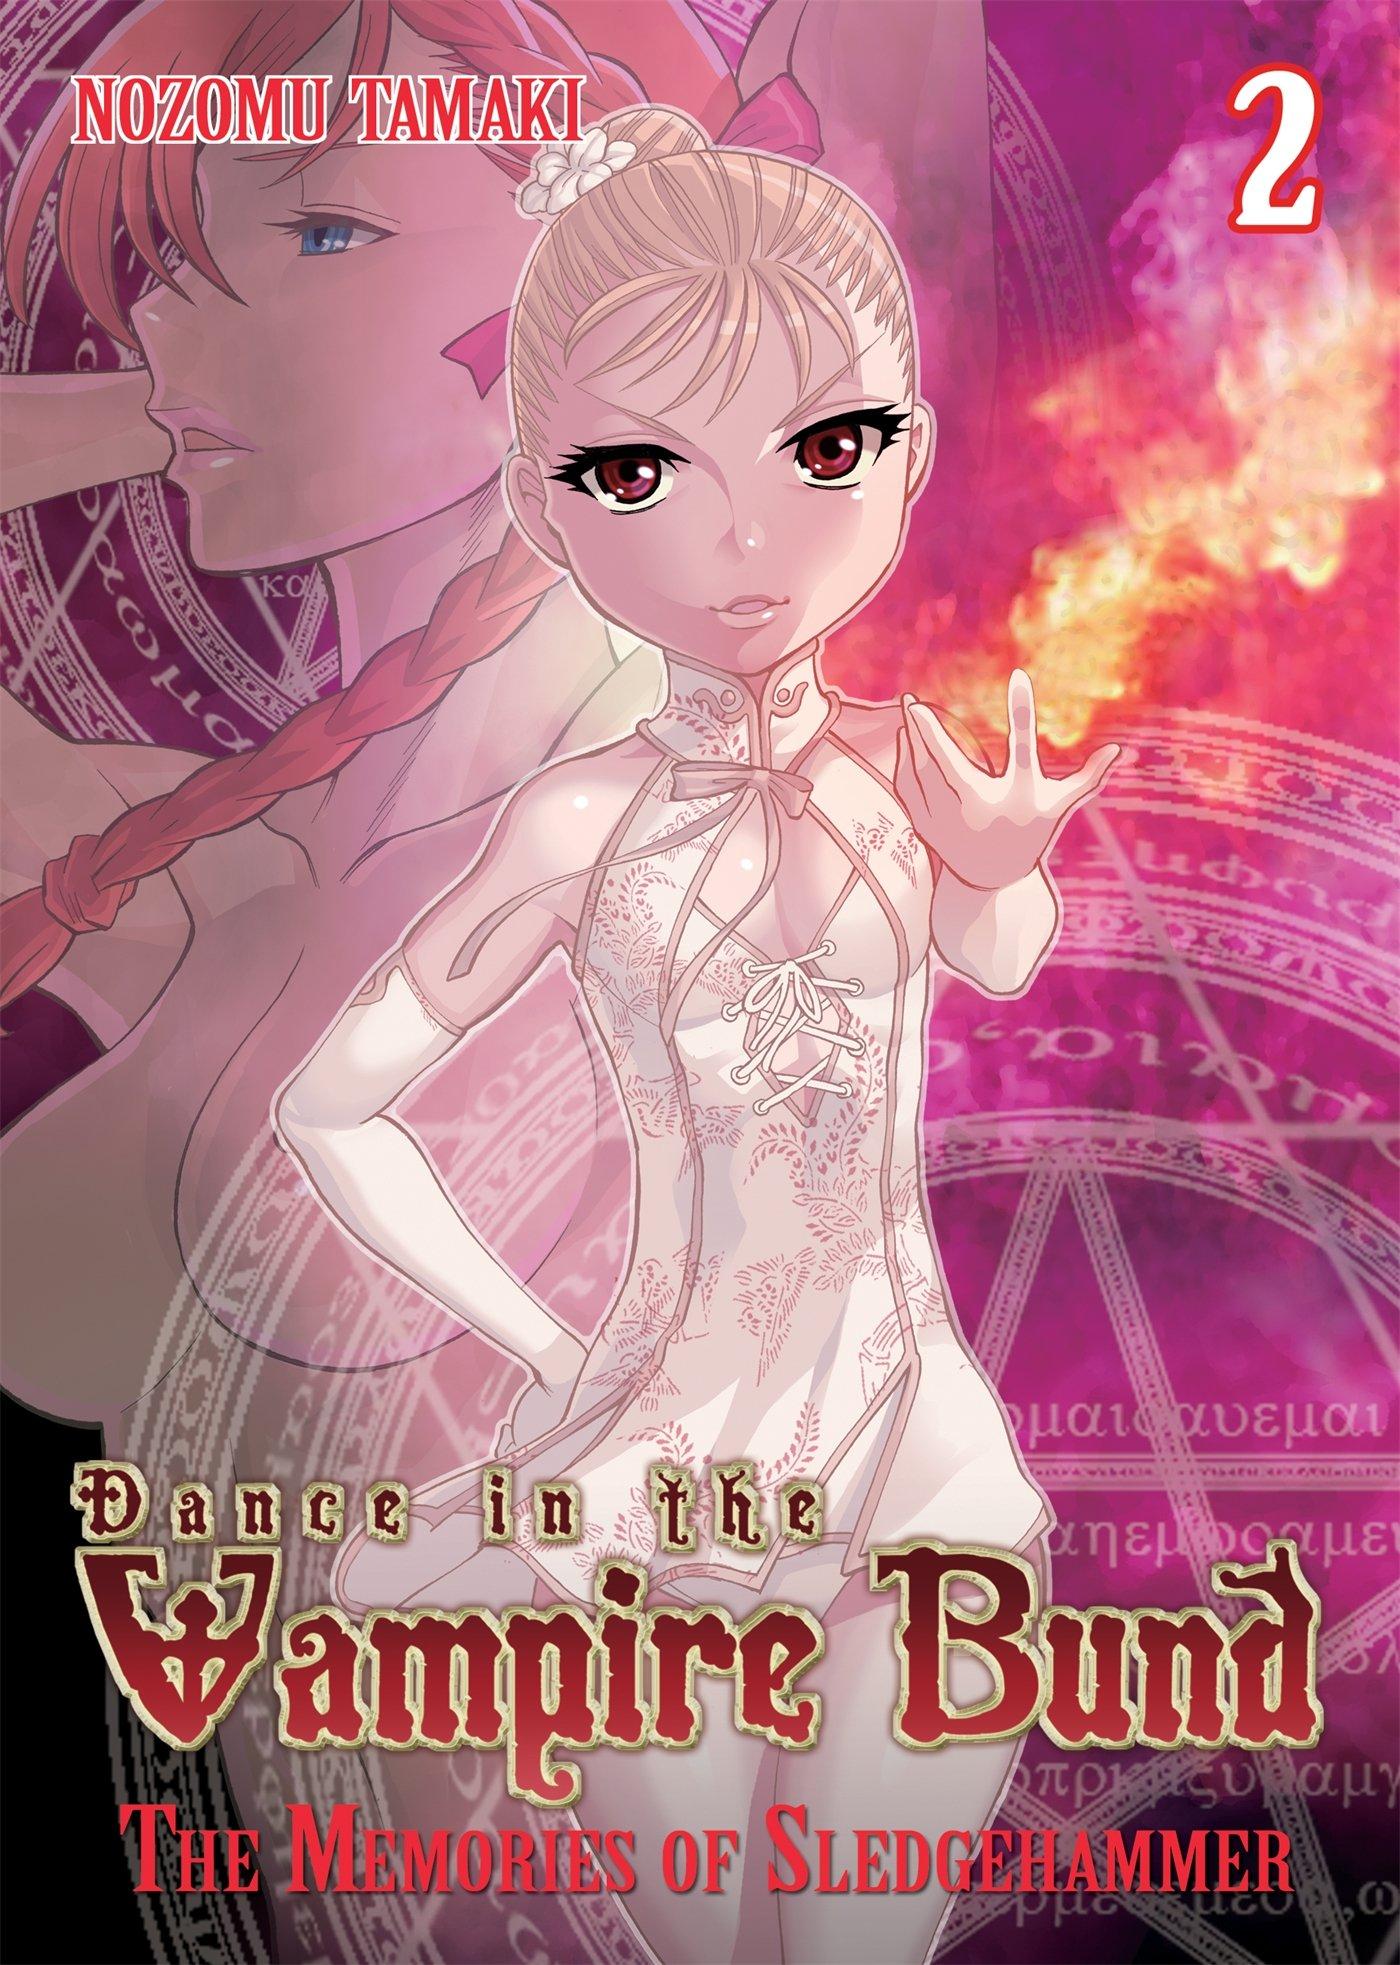 Dance in the Vampire Bund  The Memories of Sledge Hammer Vol. 2  Nozomu  Tamaki  9781626920200  Amazon.com  Books fee687fa02